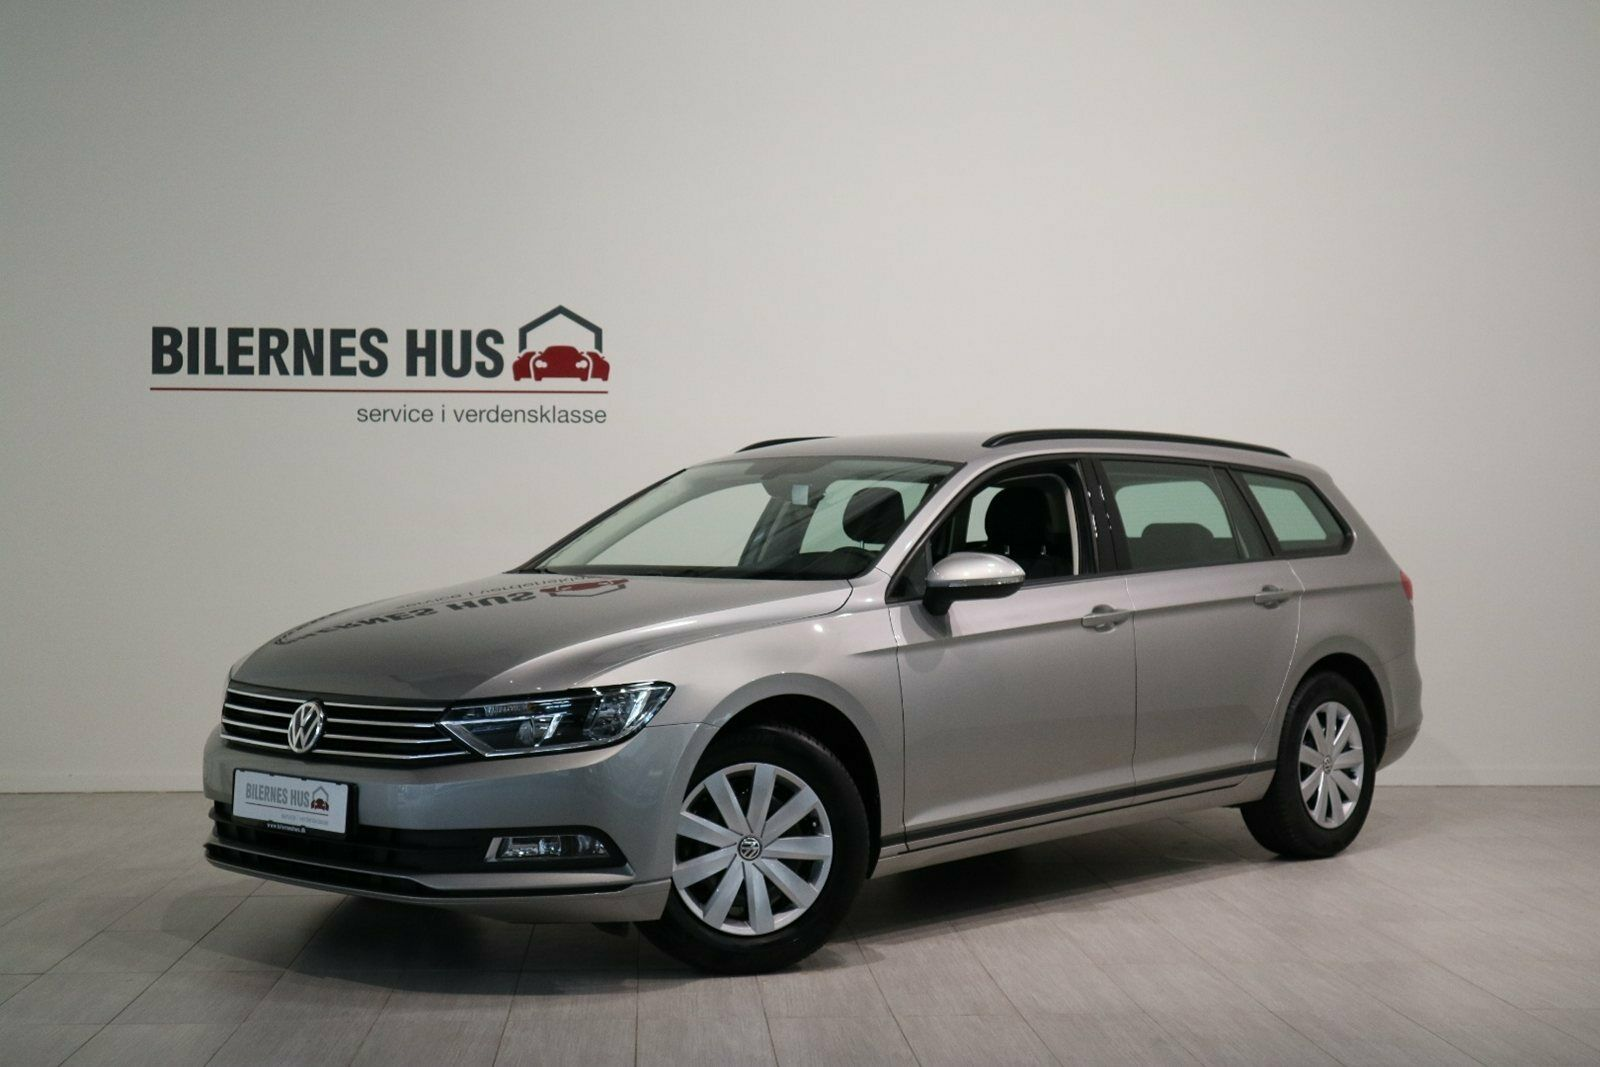 VW Passat Billede 1